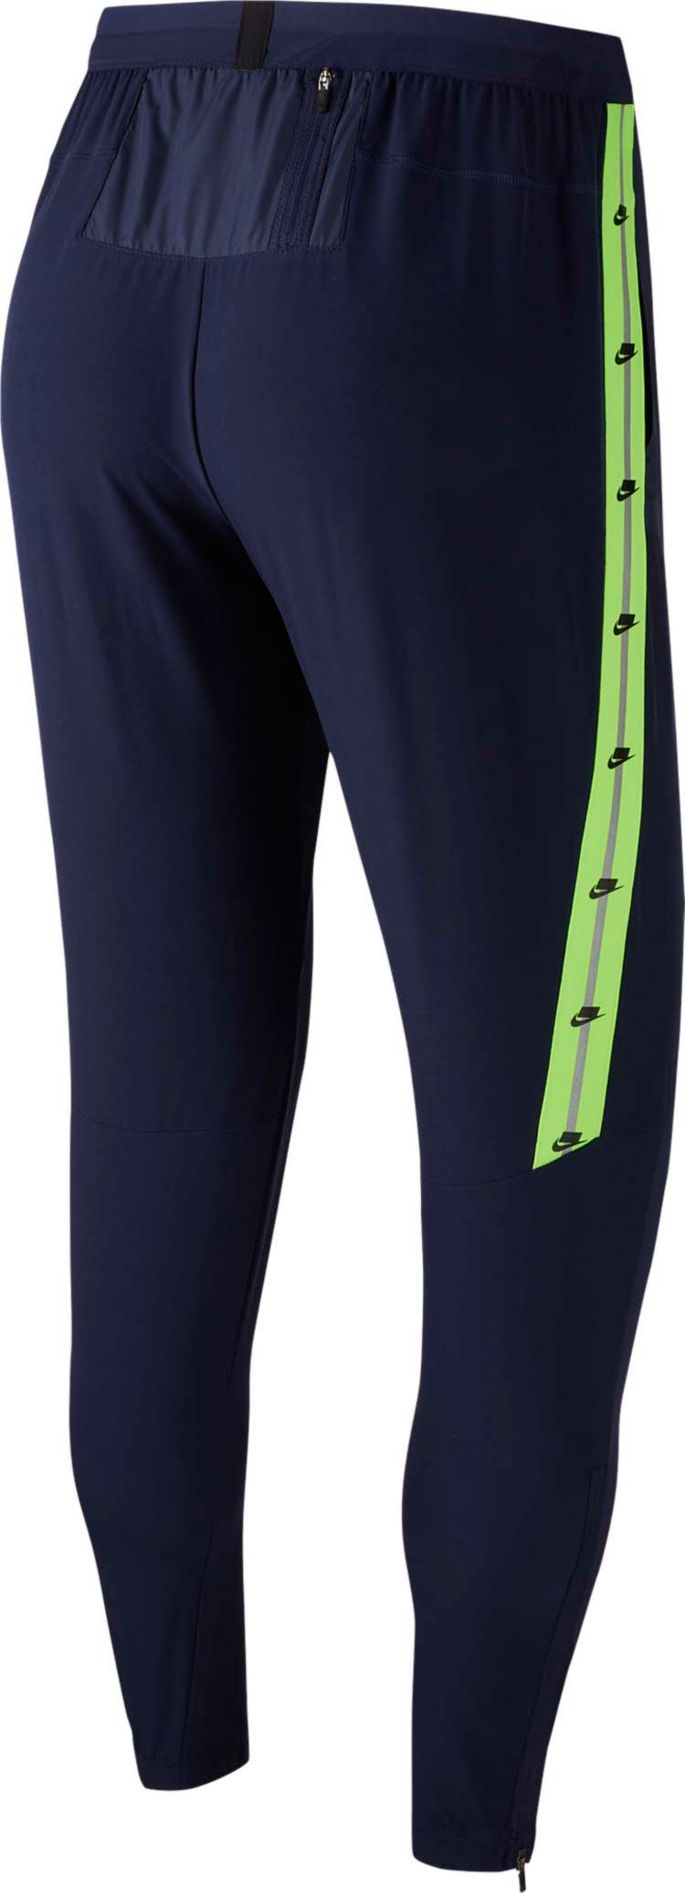 Details about Nike Flex Essential 78 Pants Men's Running Trousers Pants Bottoms